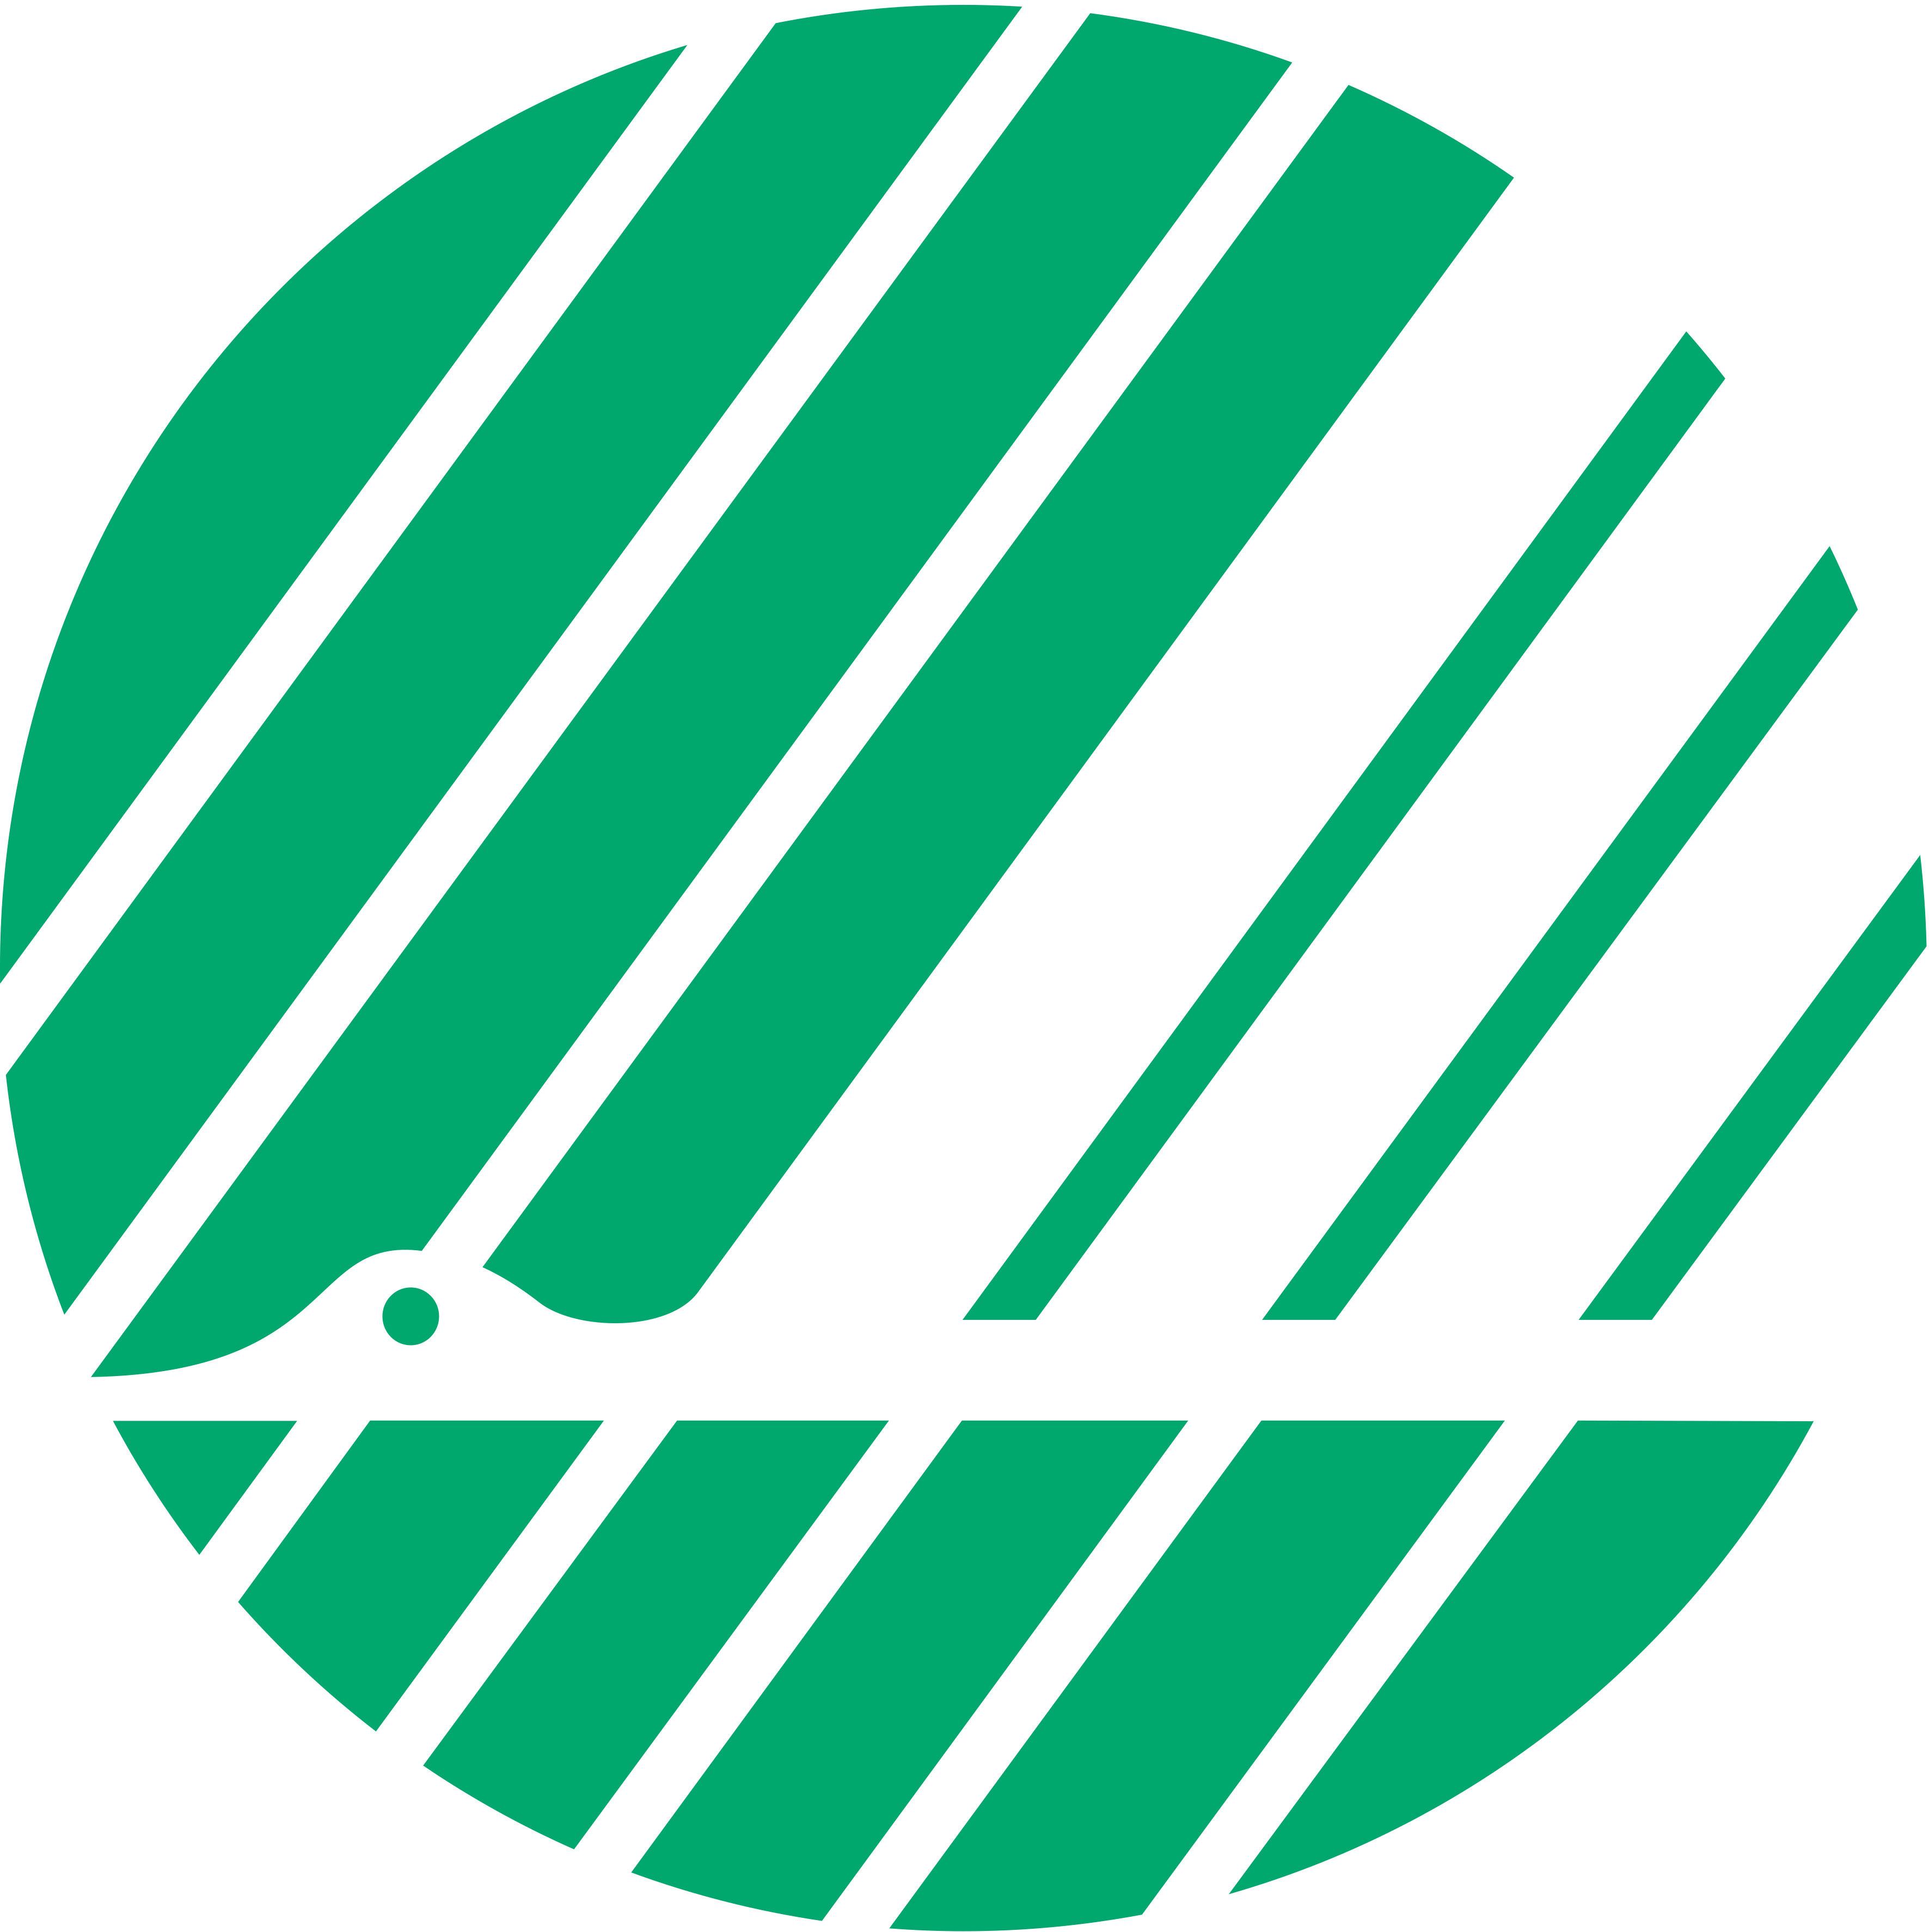 Svanemerket's logo.